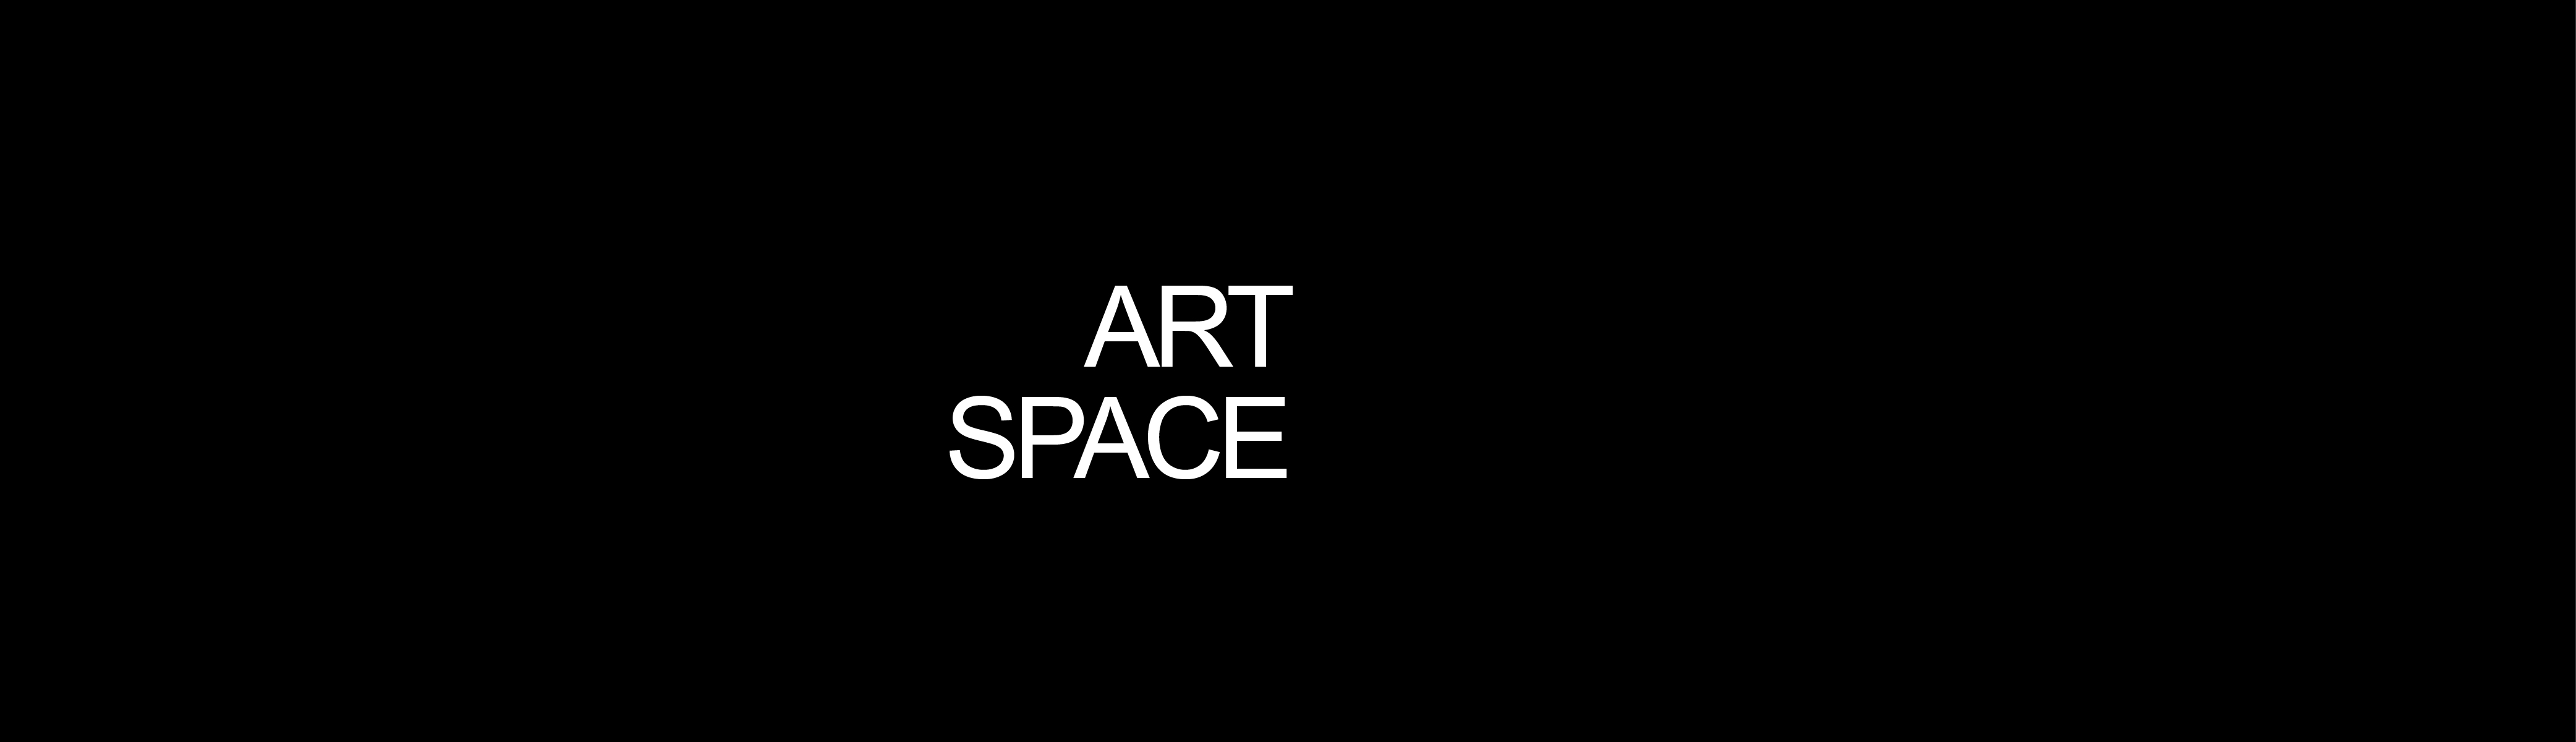 BANNER-art_space.jpg